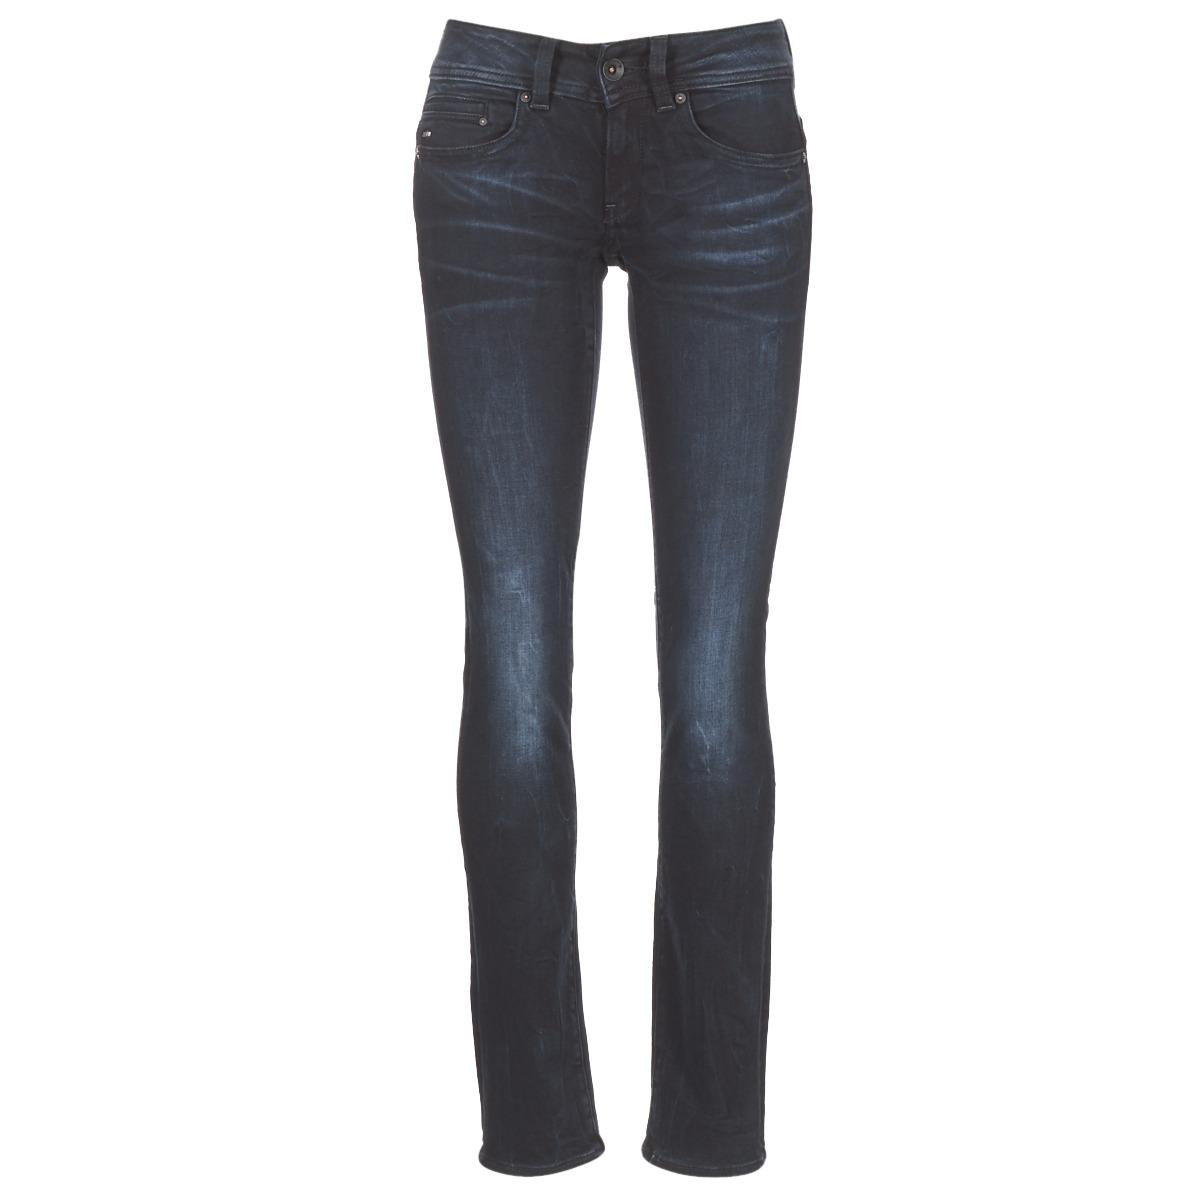 7d08f77832e G-Star RAW Midge Saddle Mid Straight Jeans in Blue - Lyst